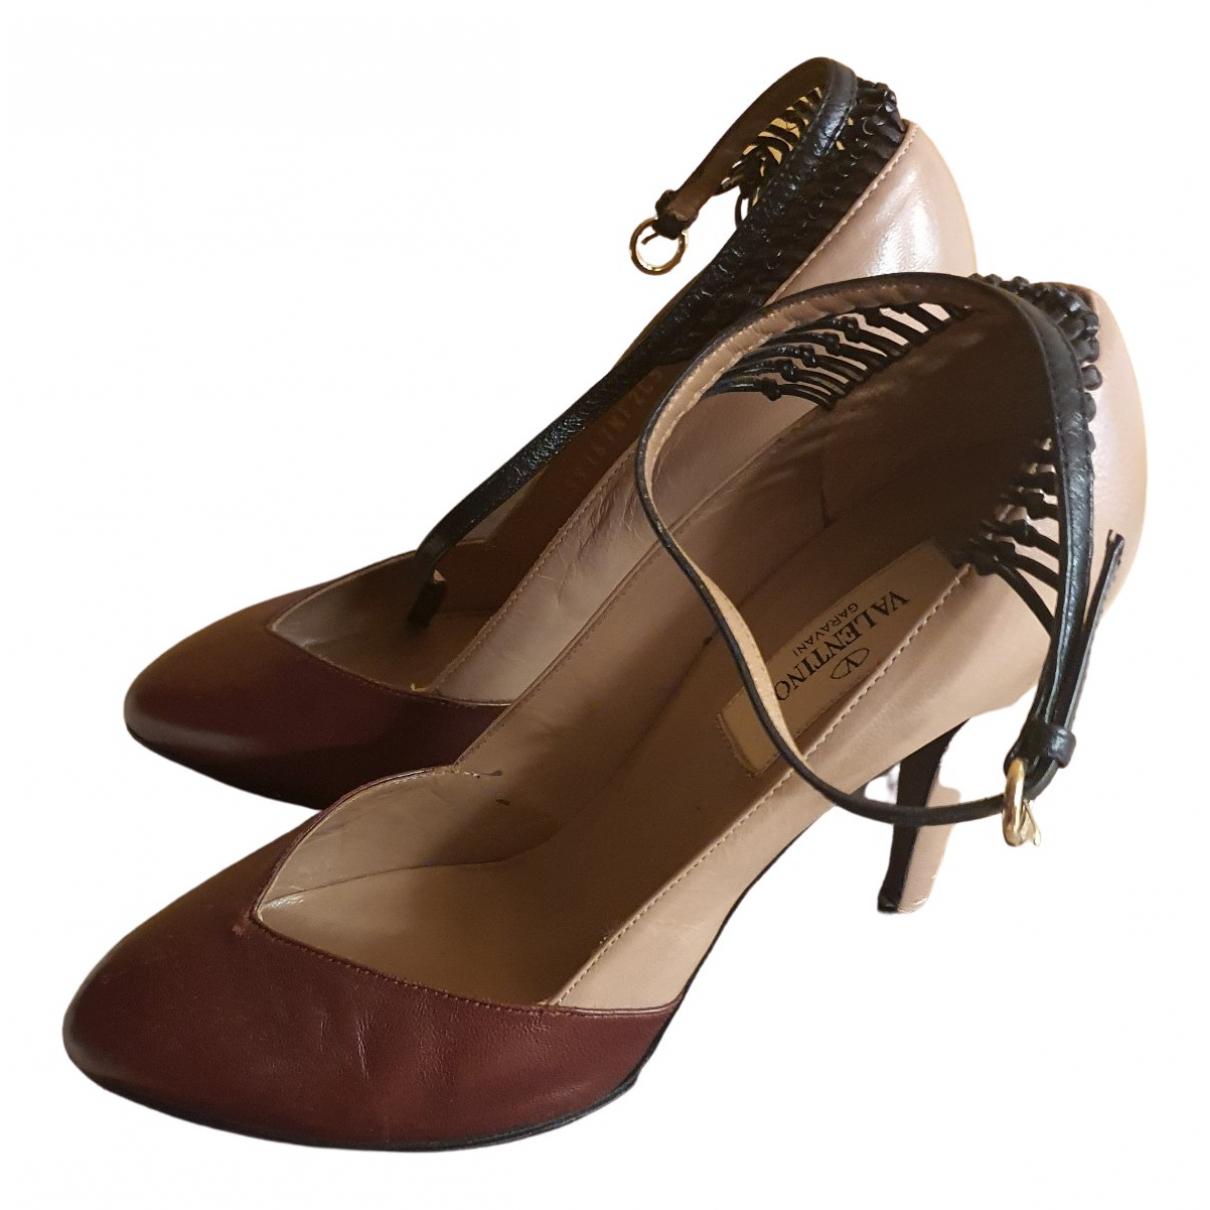 Valentino Garavani \N Burgundy Leather Heels for Women 7.5 US